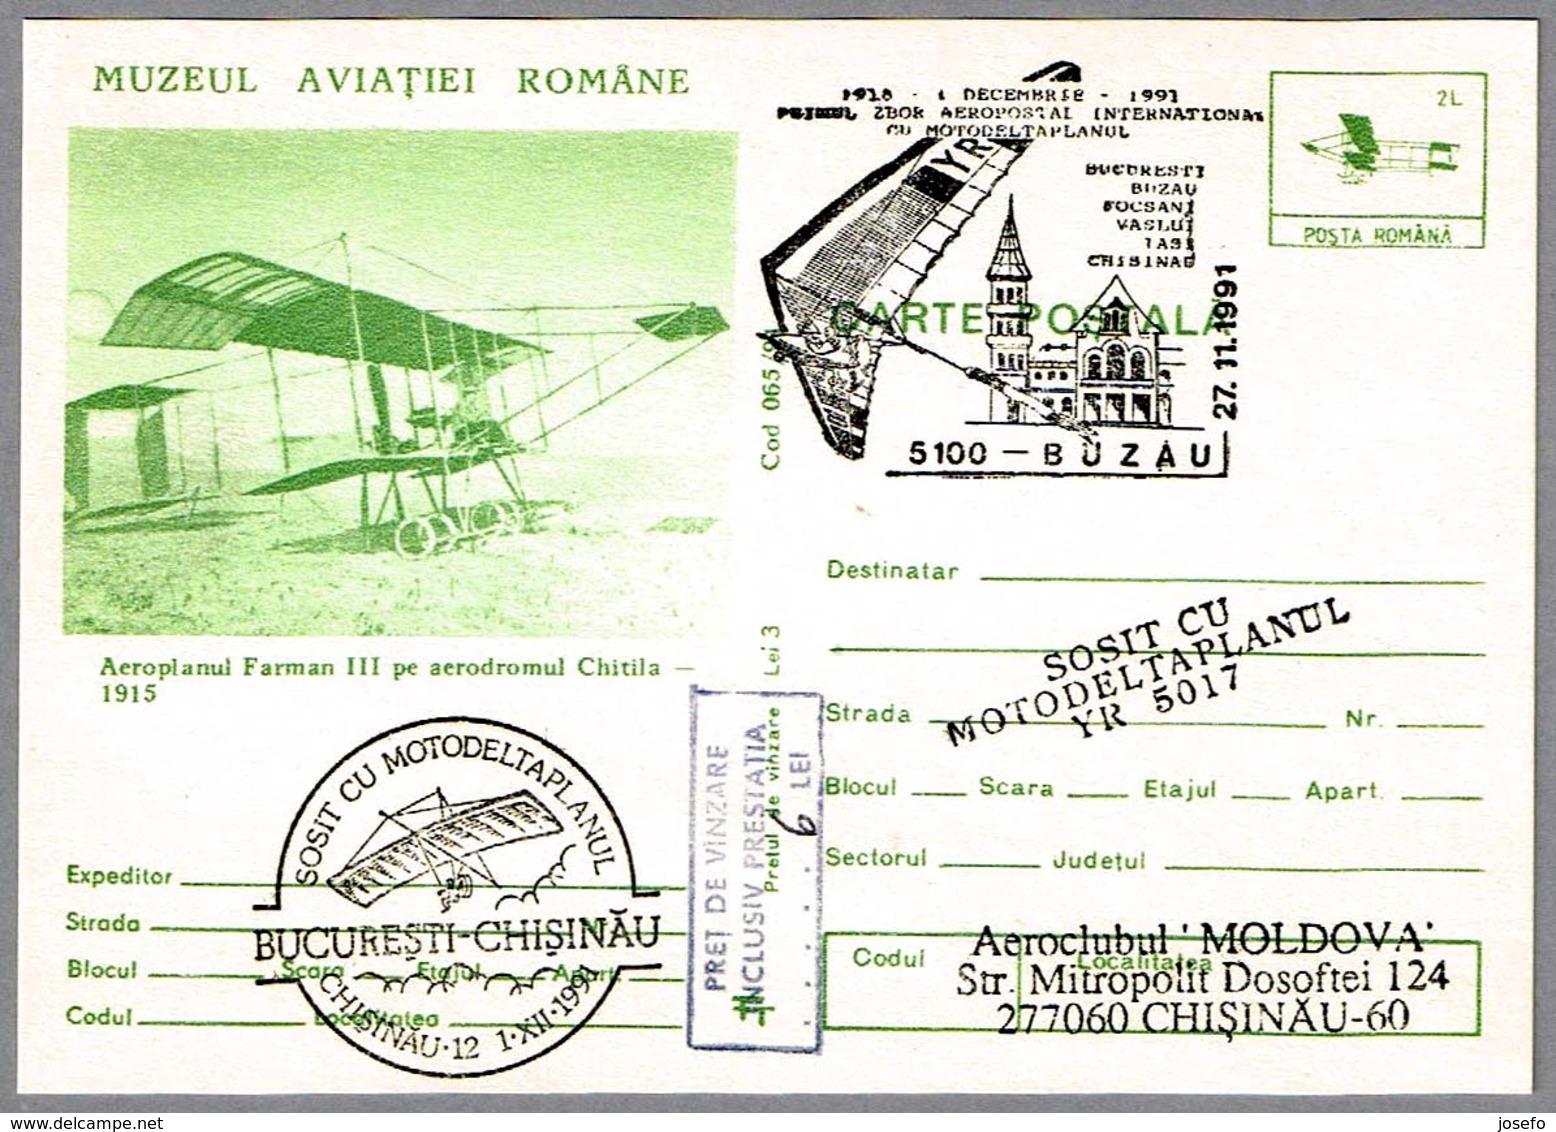 Primer Vuelo Aeropostal Internacional En ALA DELTA CON MOTOR - Ultra Light Trike. Buzau 1991 - Correo Postal